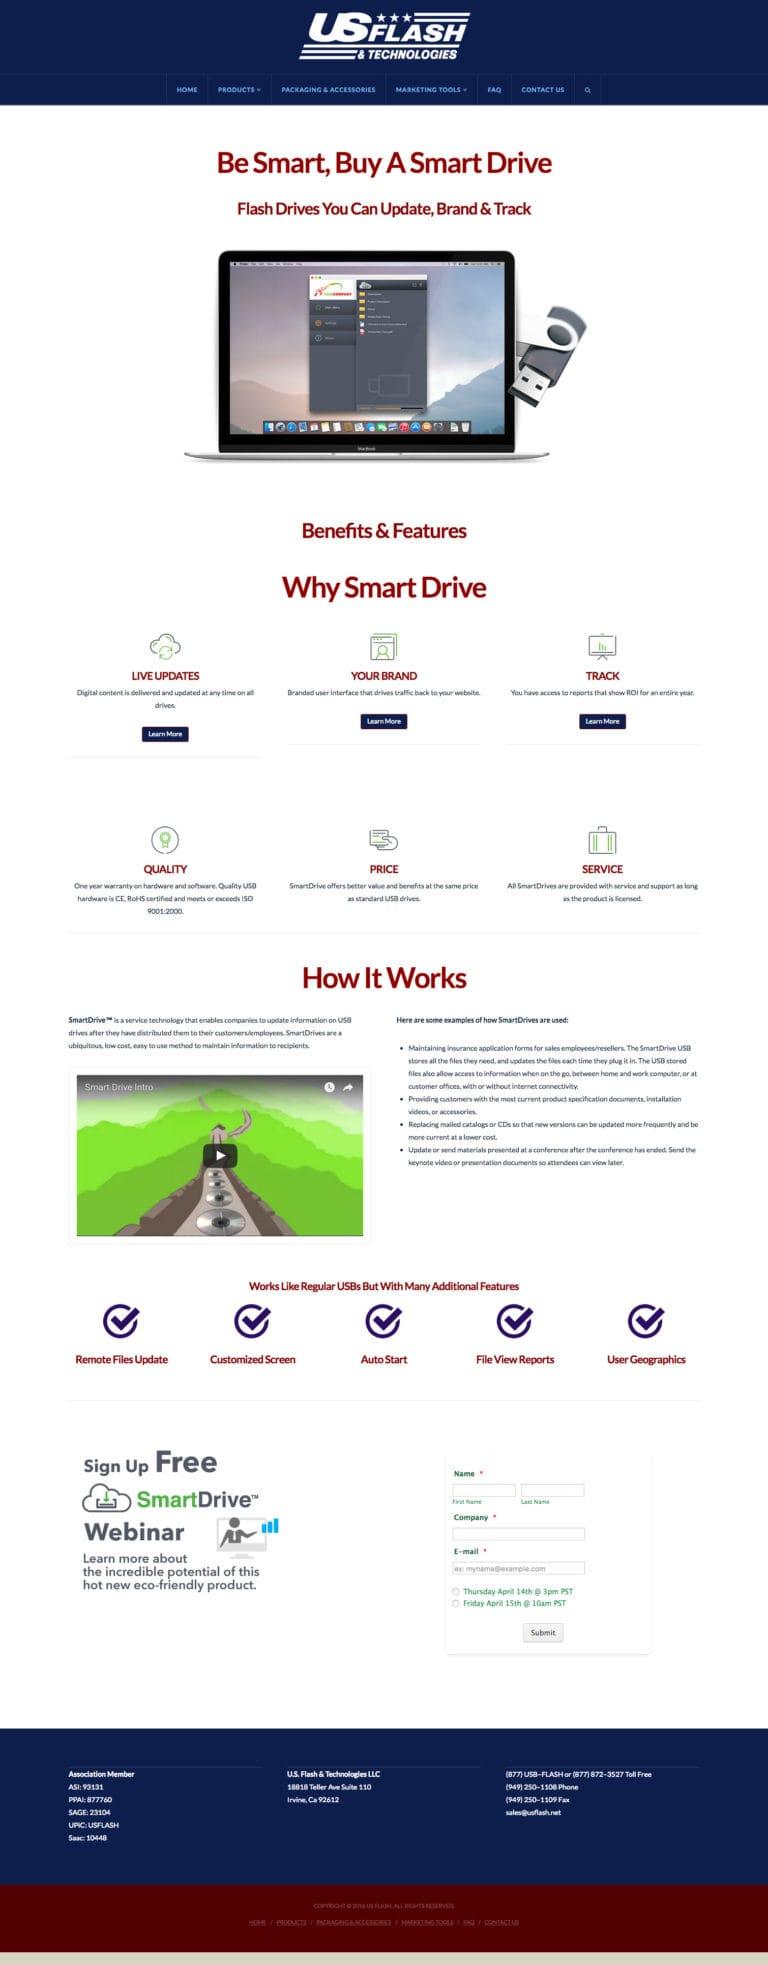 Web Design & Development – US Flash